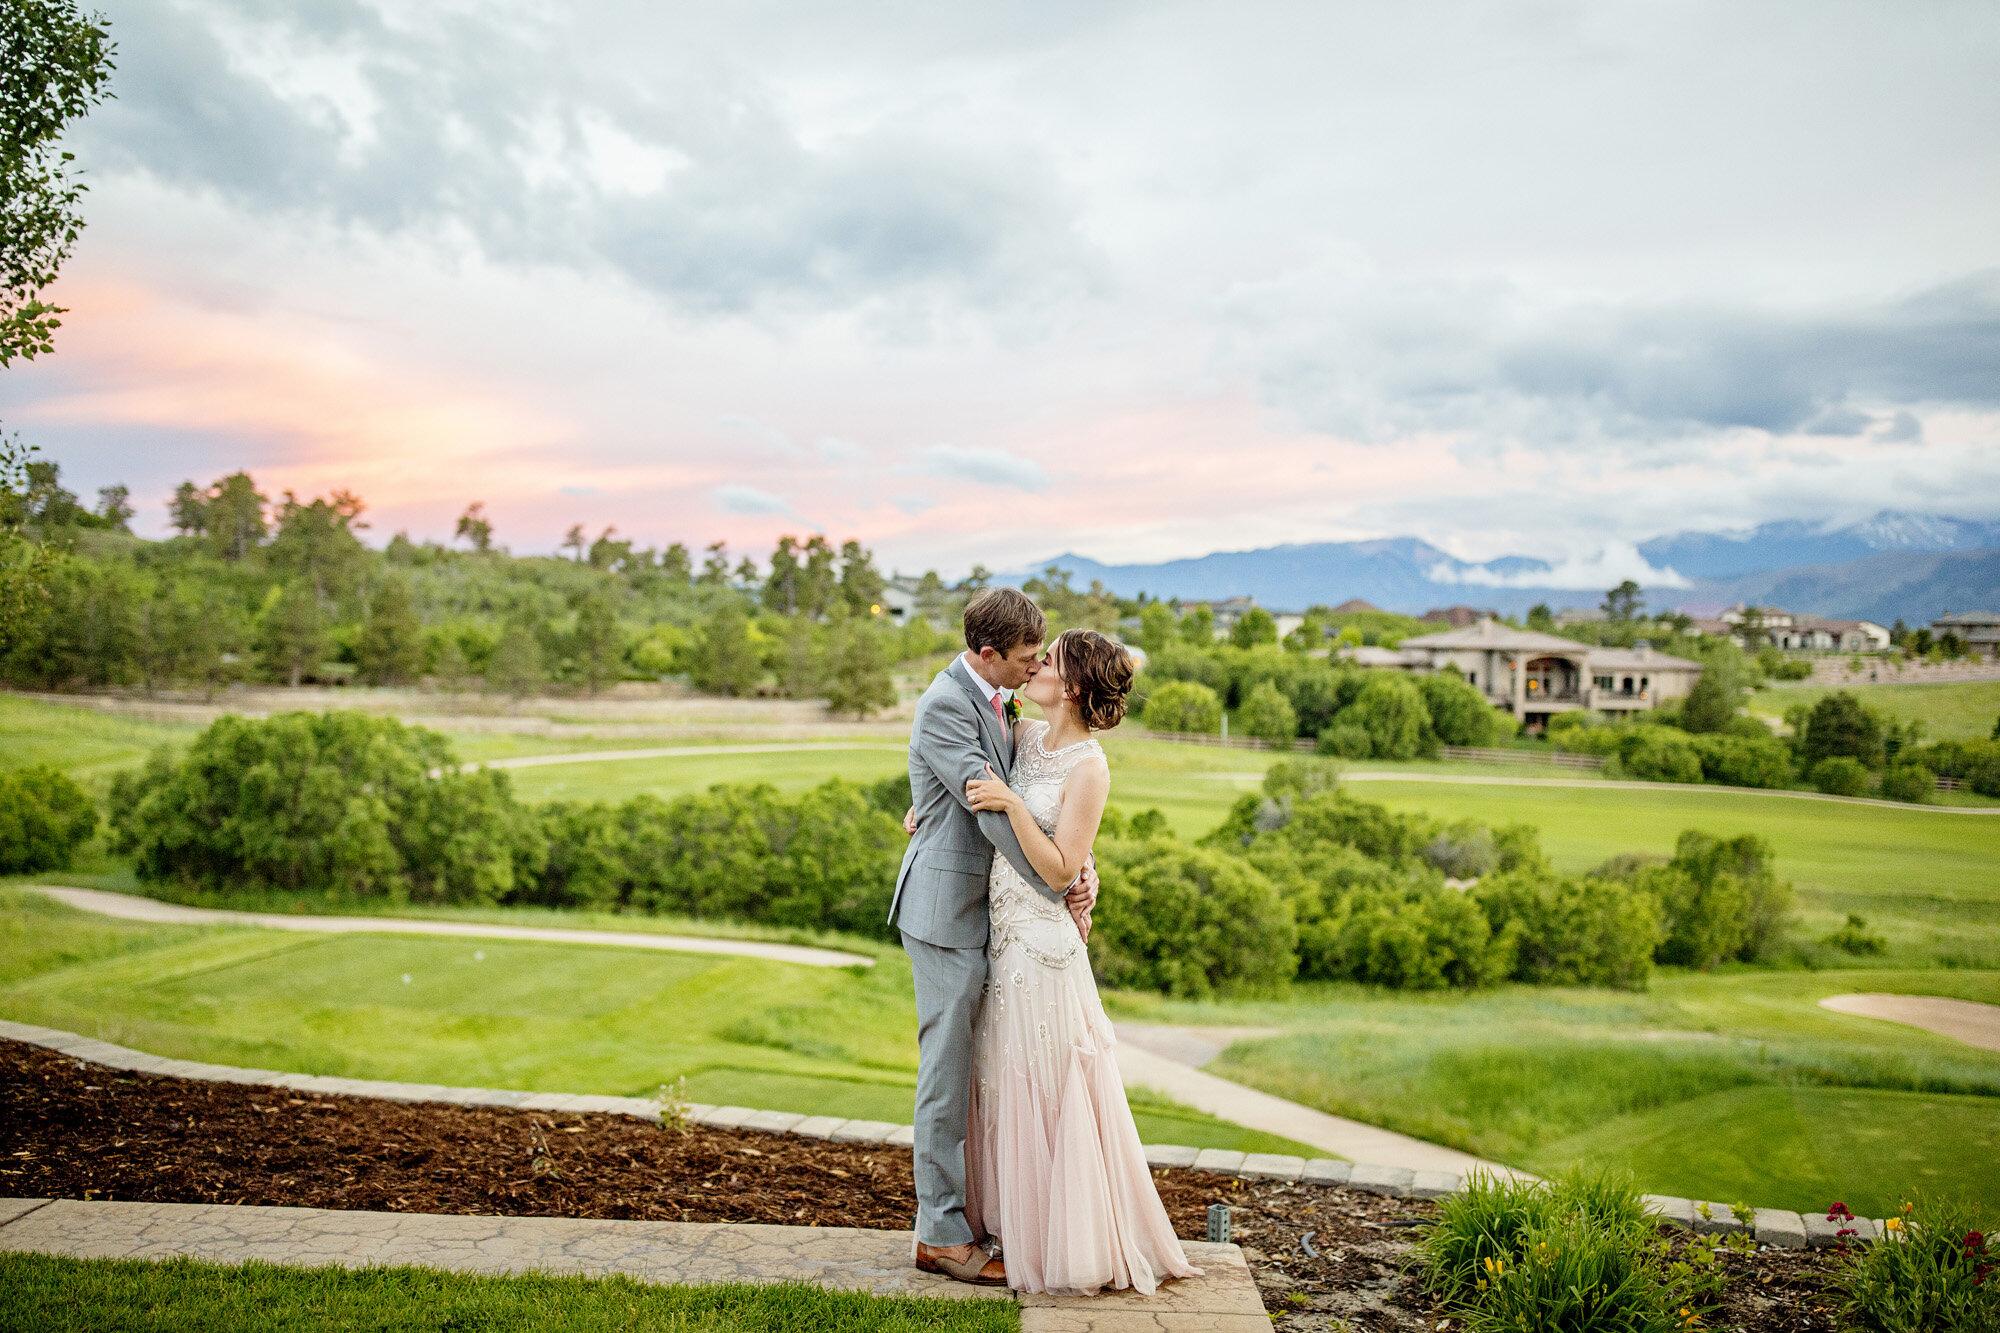 Seriously_Sabrina_Photography_Colorado_Springs_Club_at_Flying_Horse_Destination_Wedding_ODwyer1.jpg